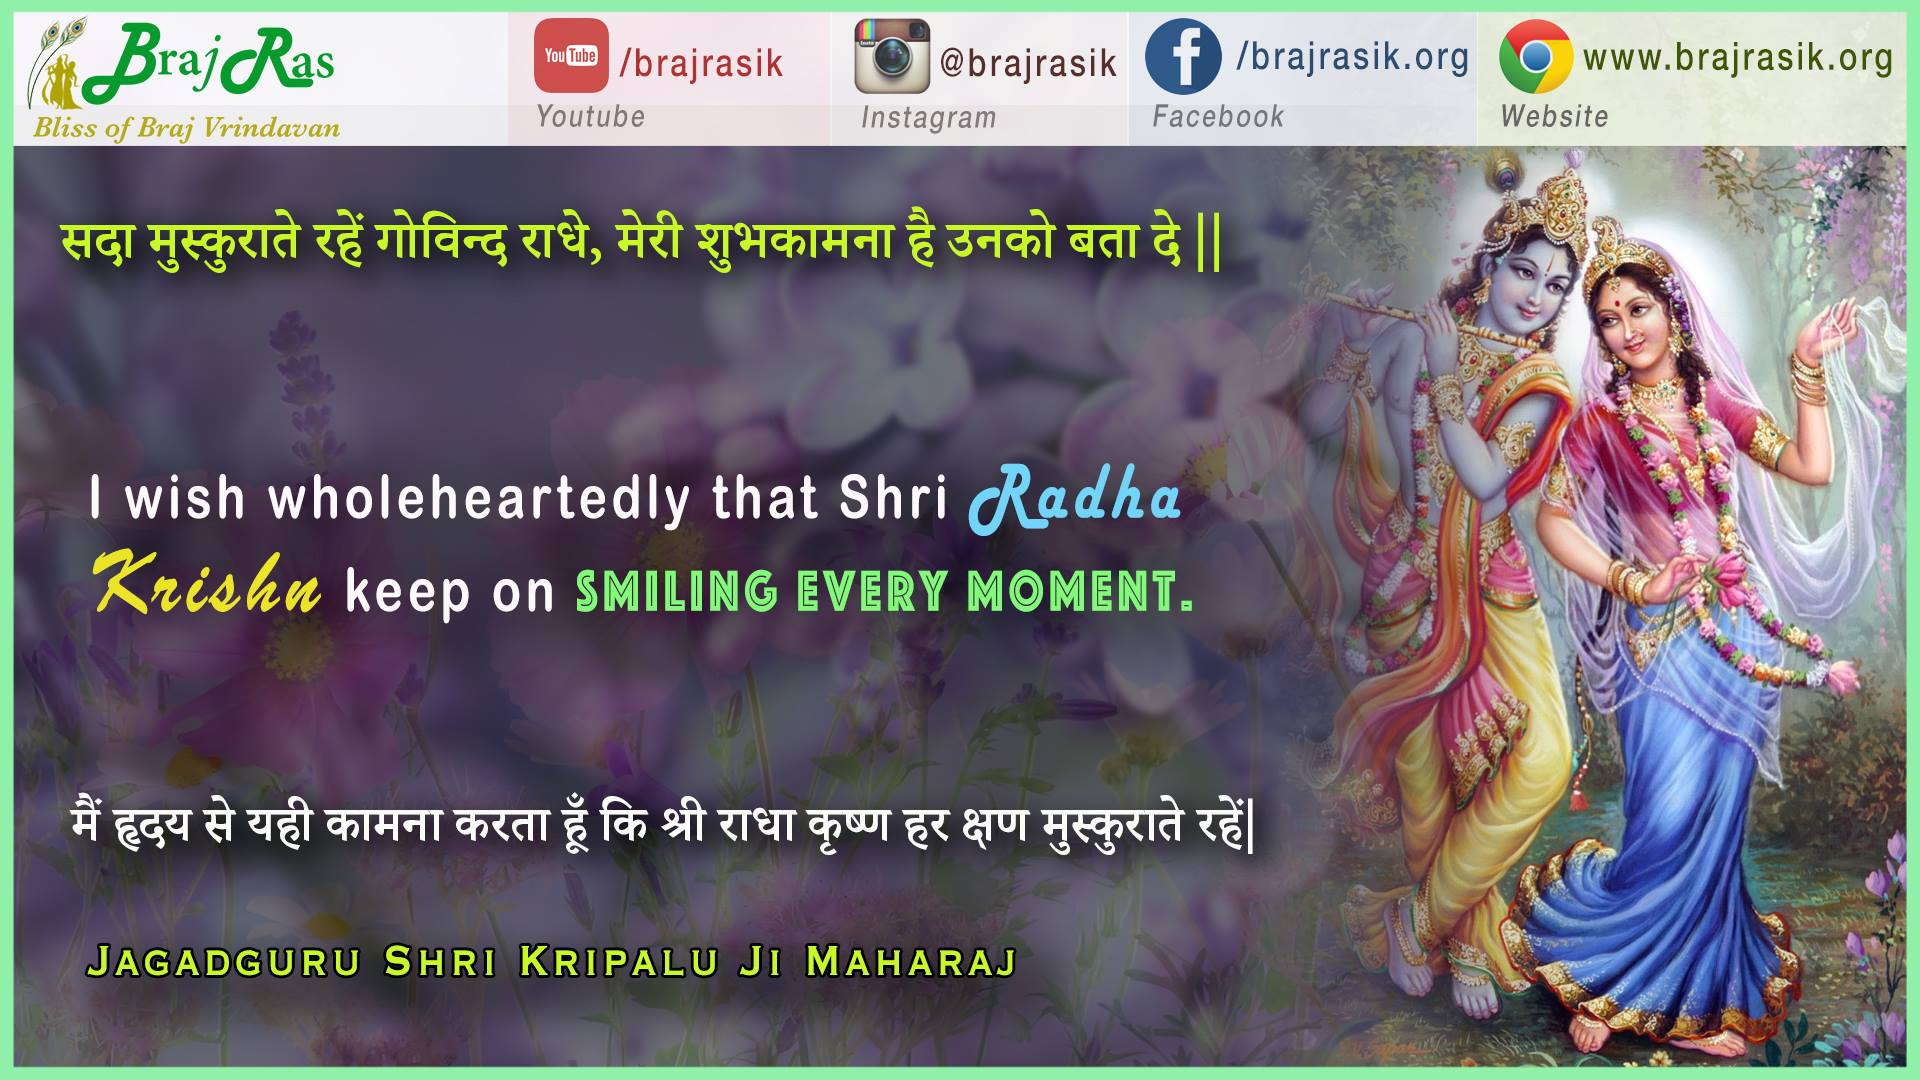 Sada Muskurate Rahein Govind Radhey, Meri Shubhkamna Hai Unko Bata De - Jagadguru Shri Kripalu Ji Maharaj